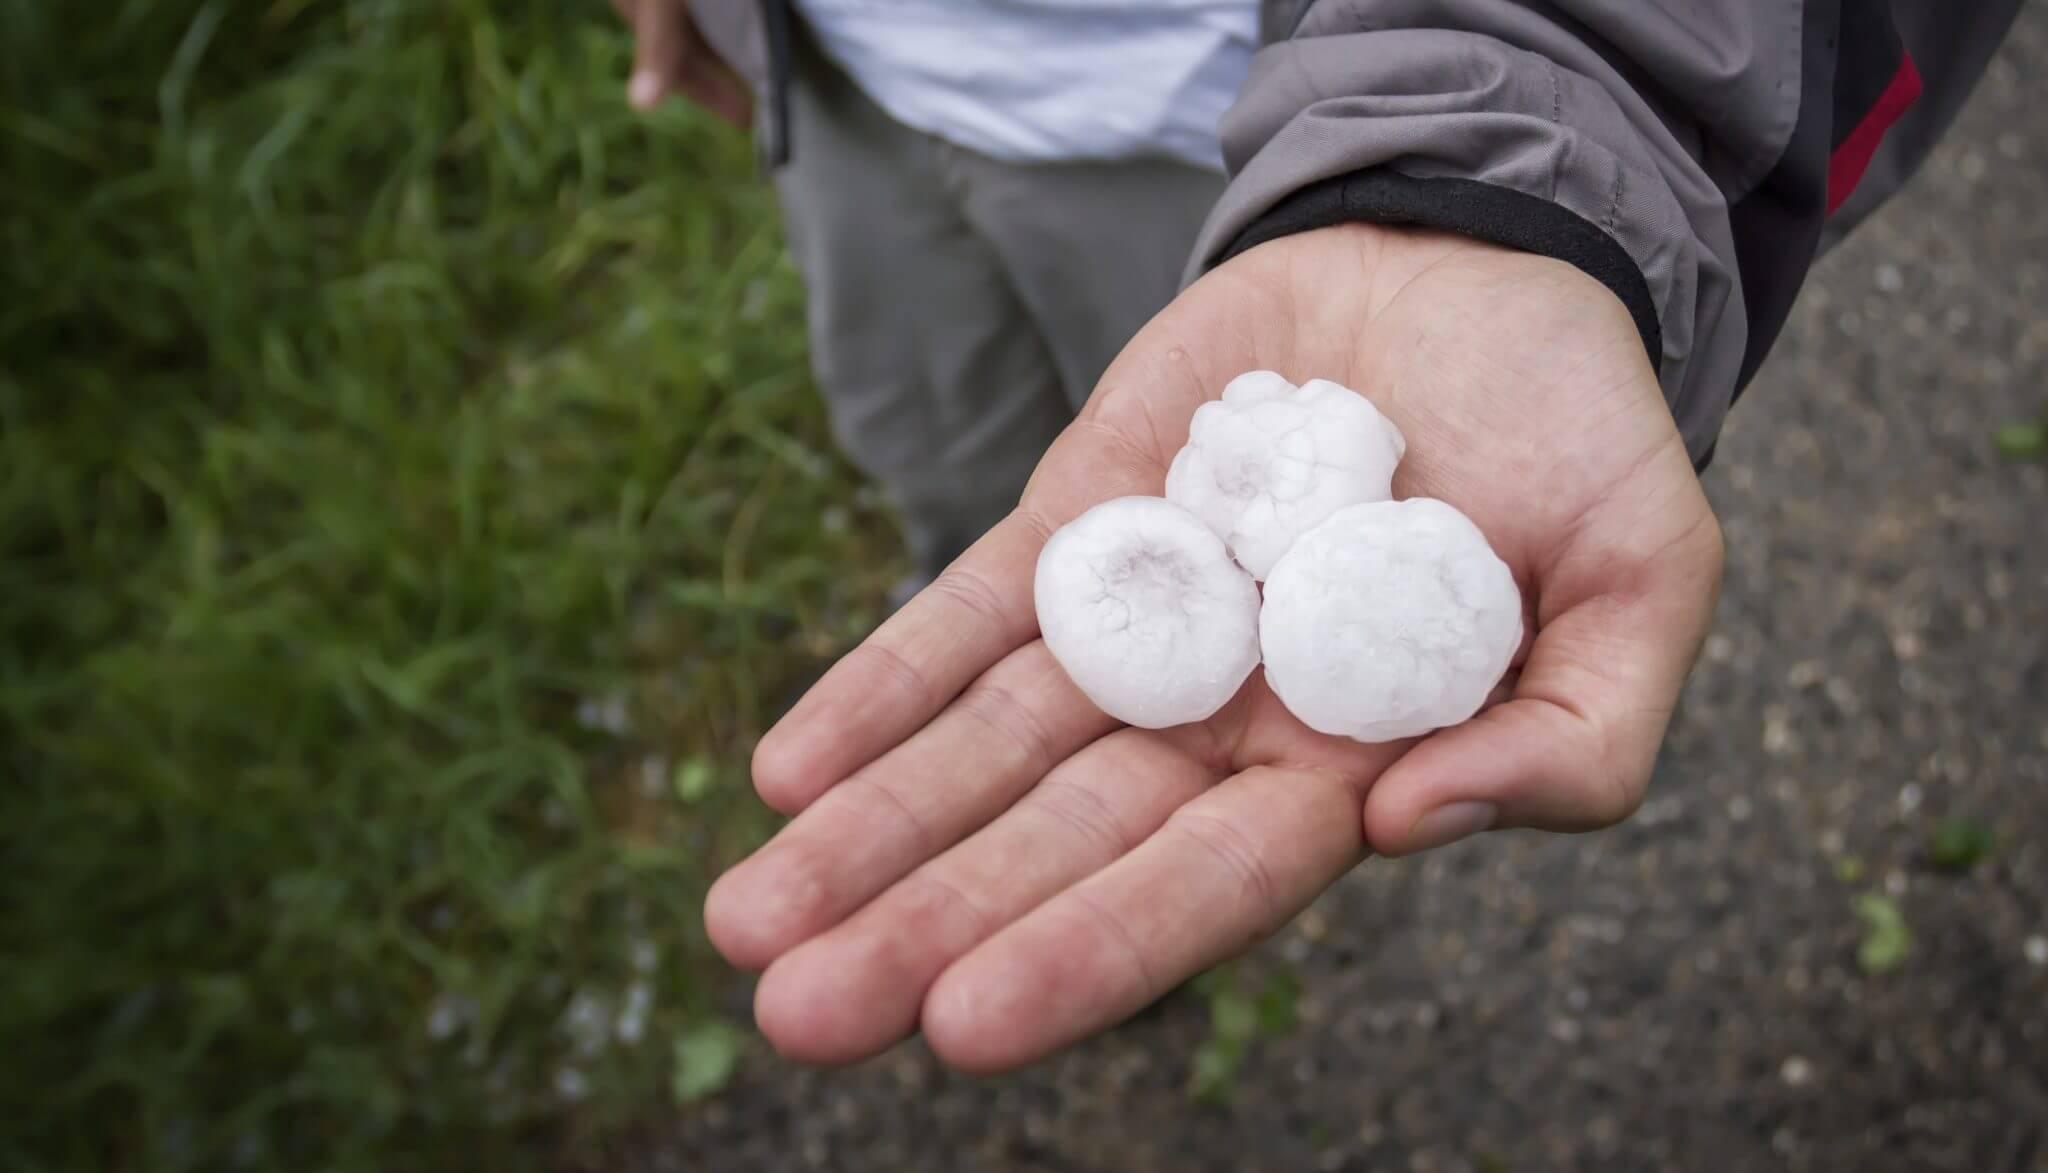 Hail Balls In Hand